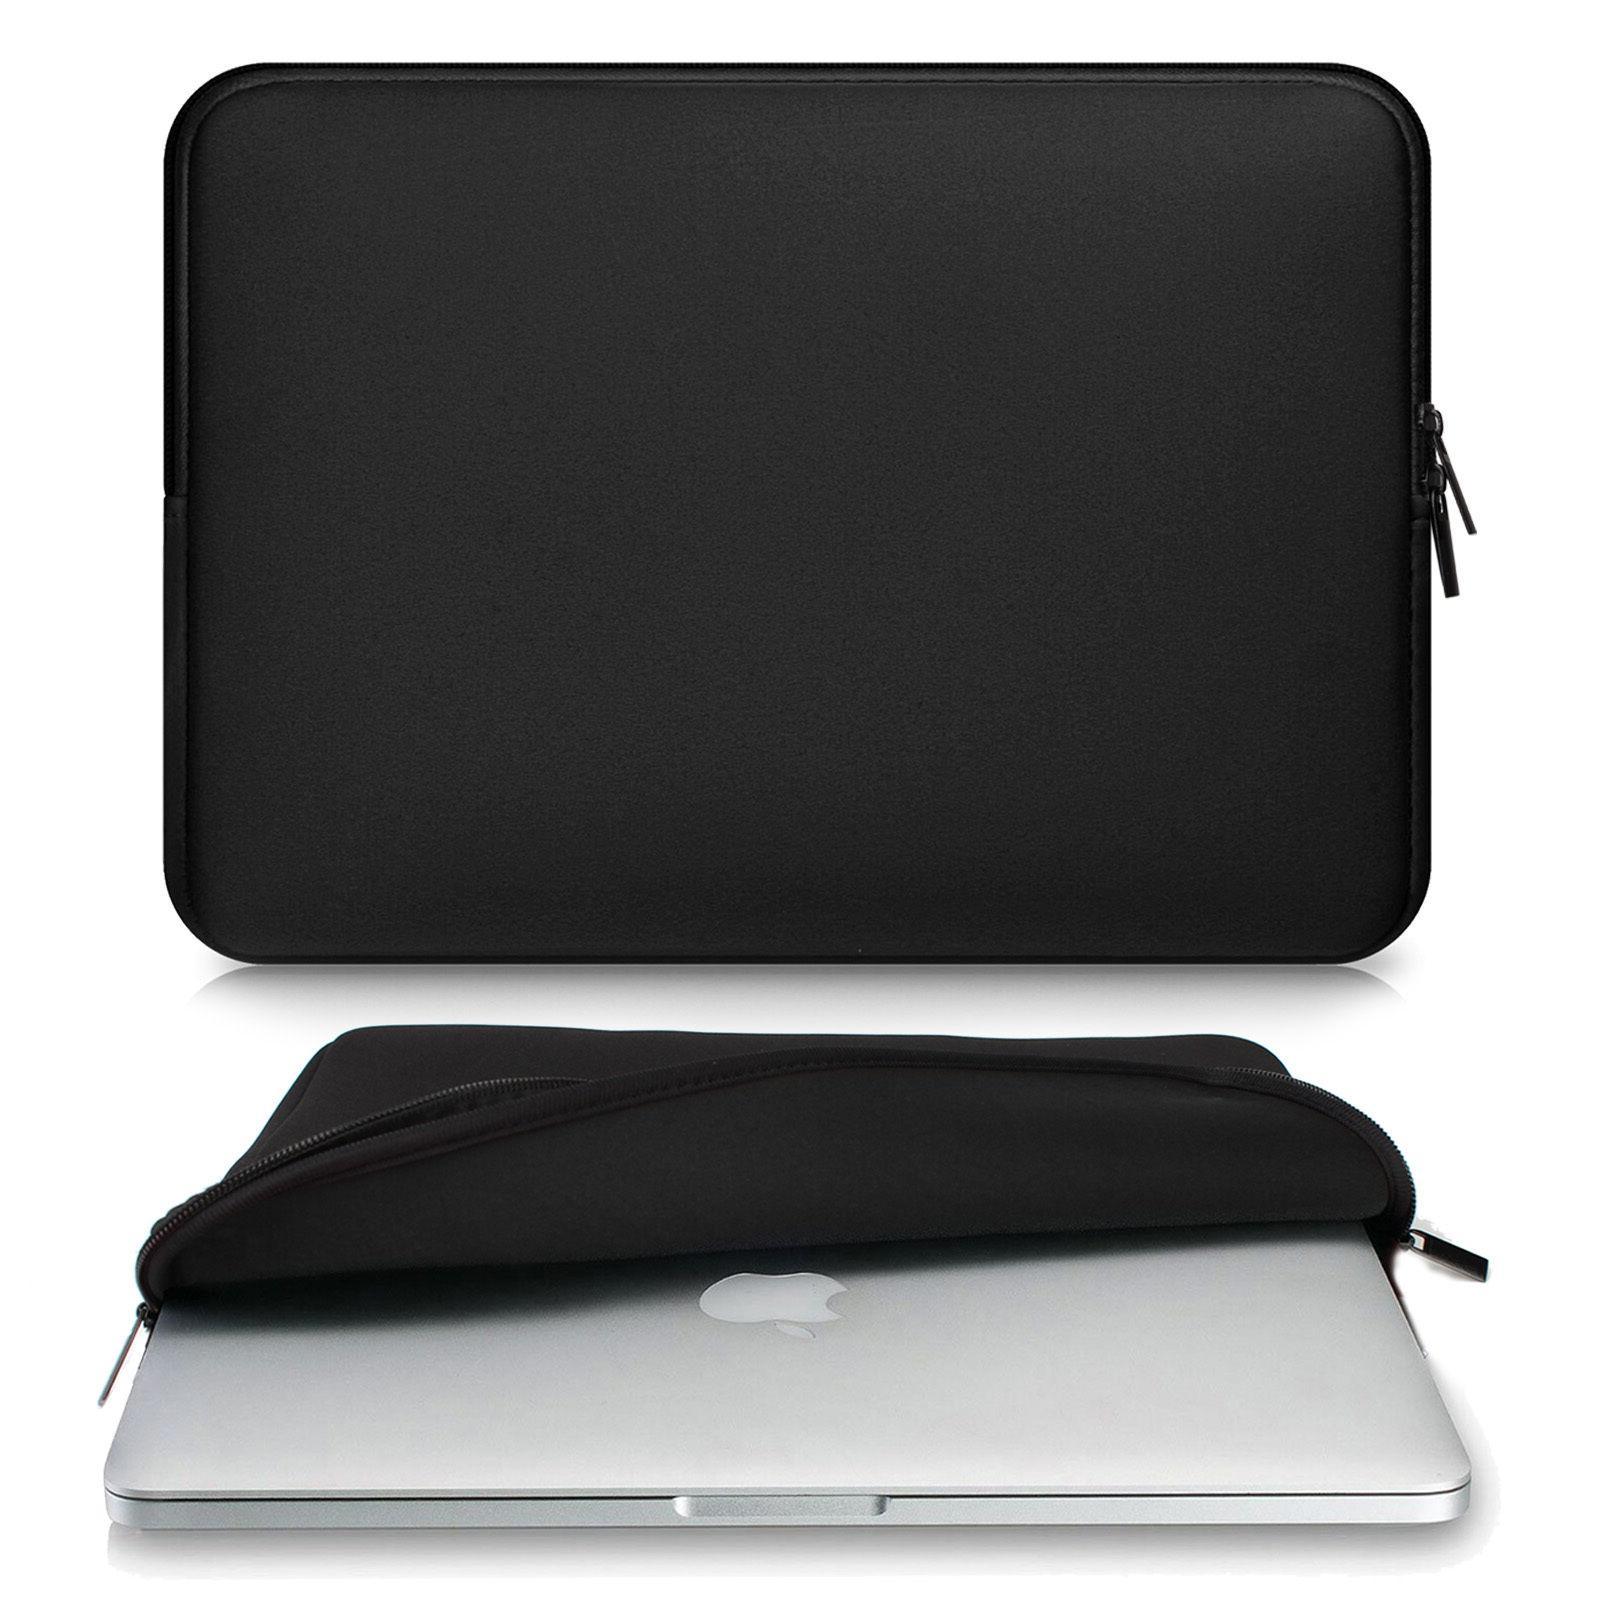 BLACK Zipper Sleeve Bag Case Cover for All Laptop 13-15.4''